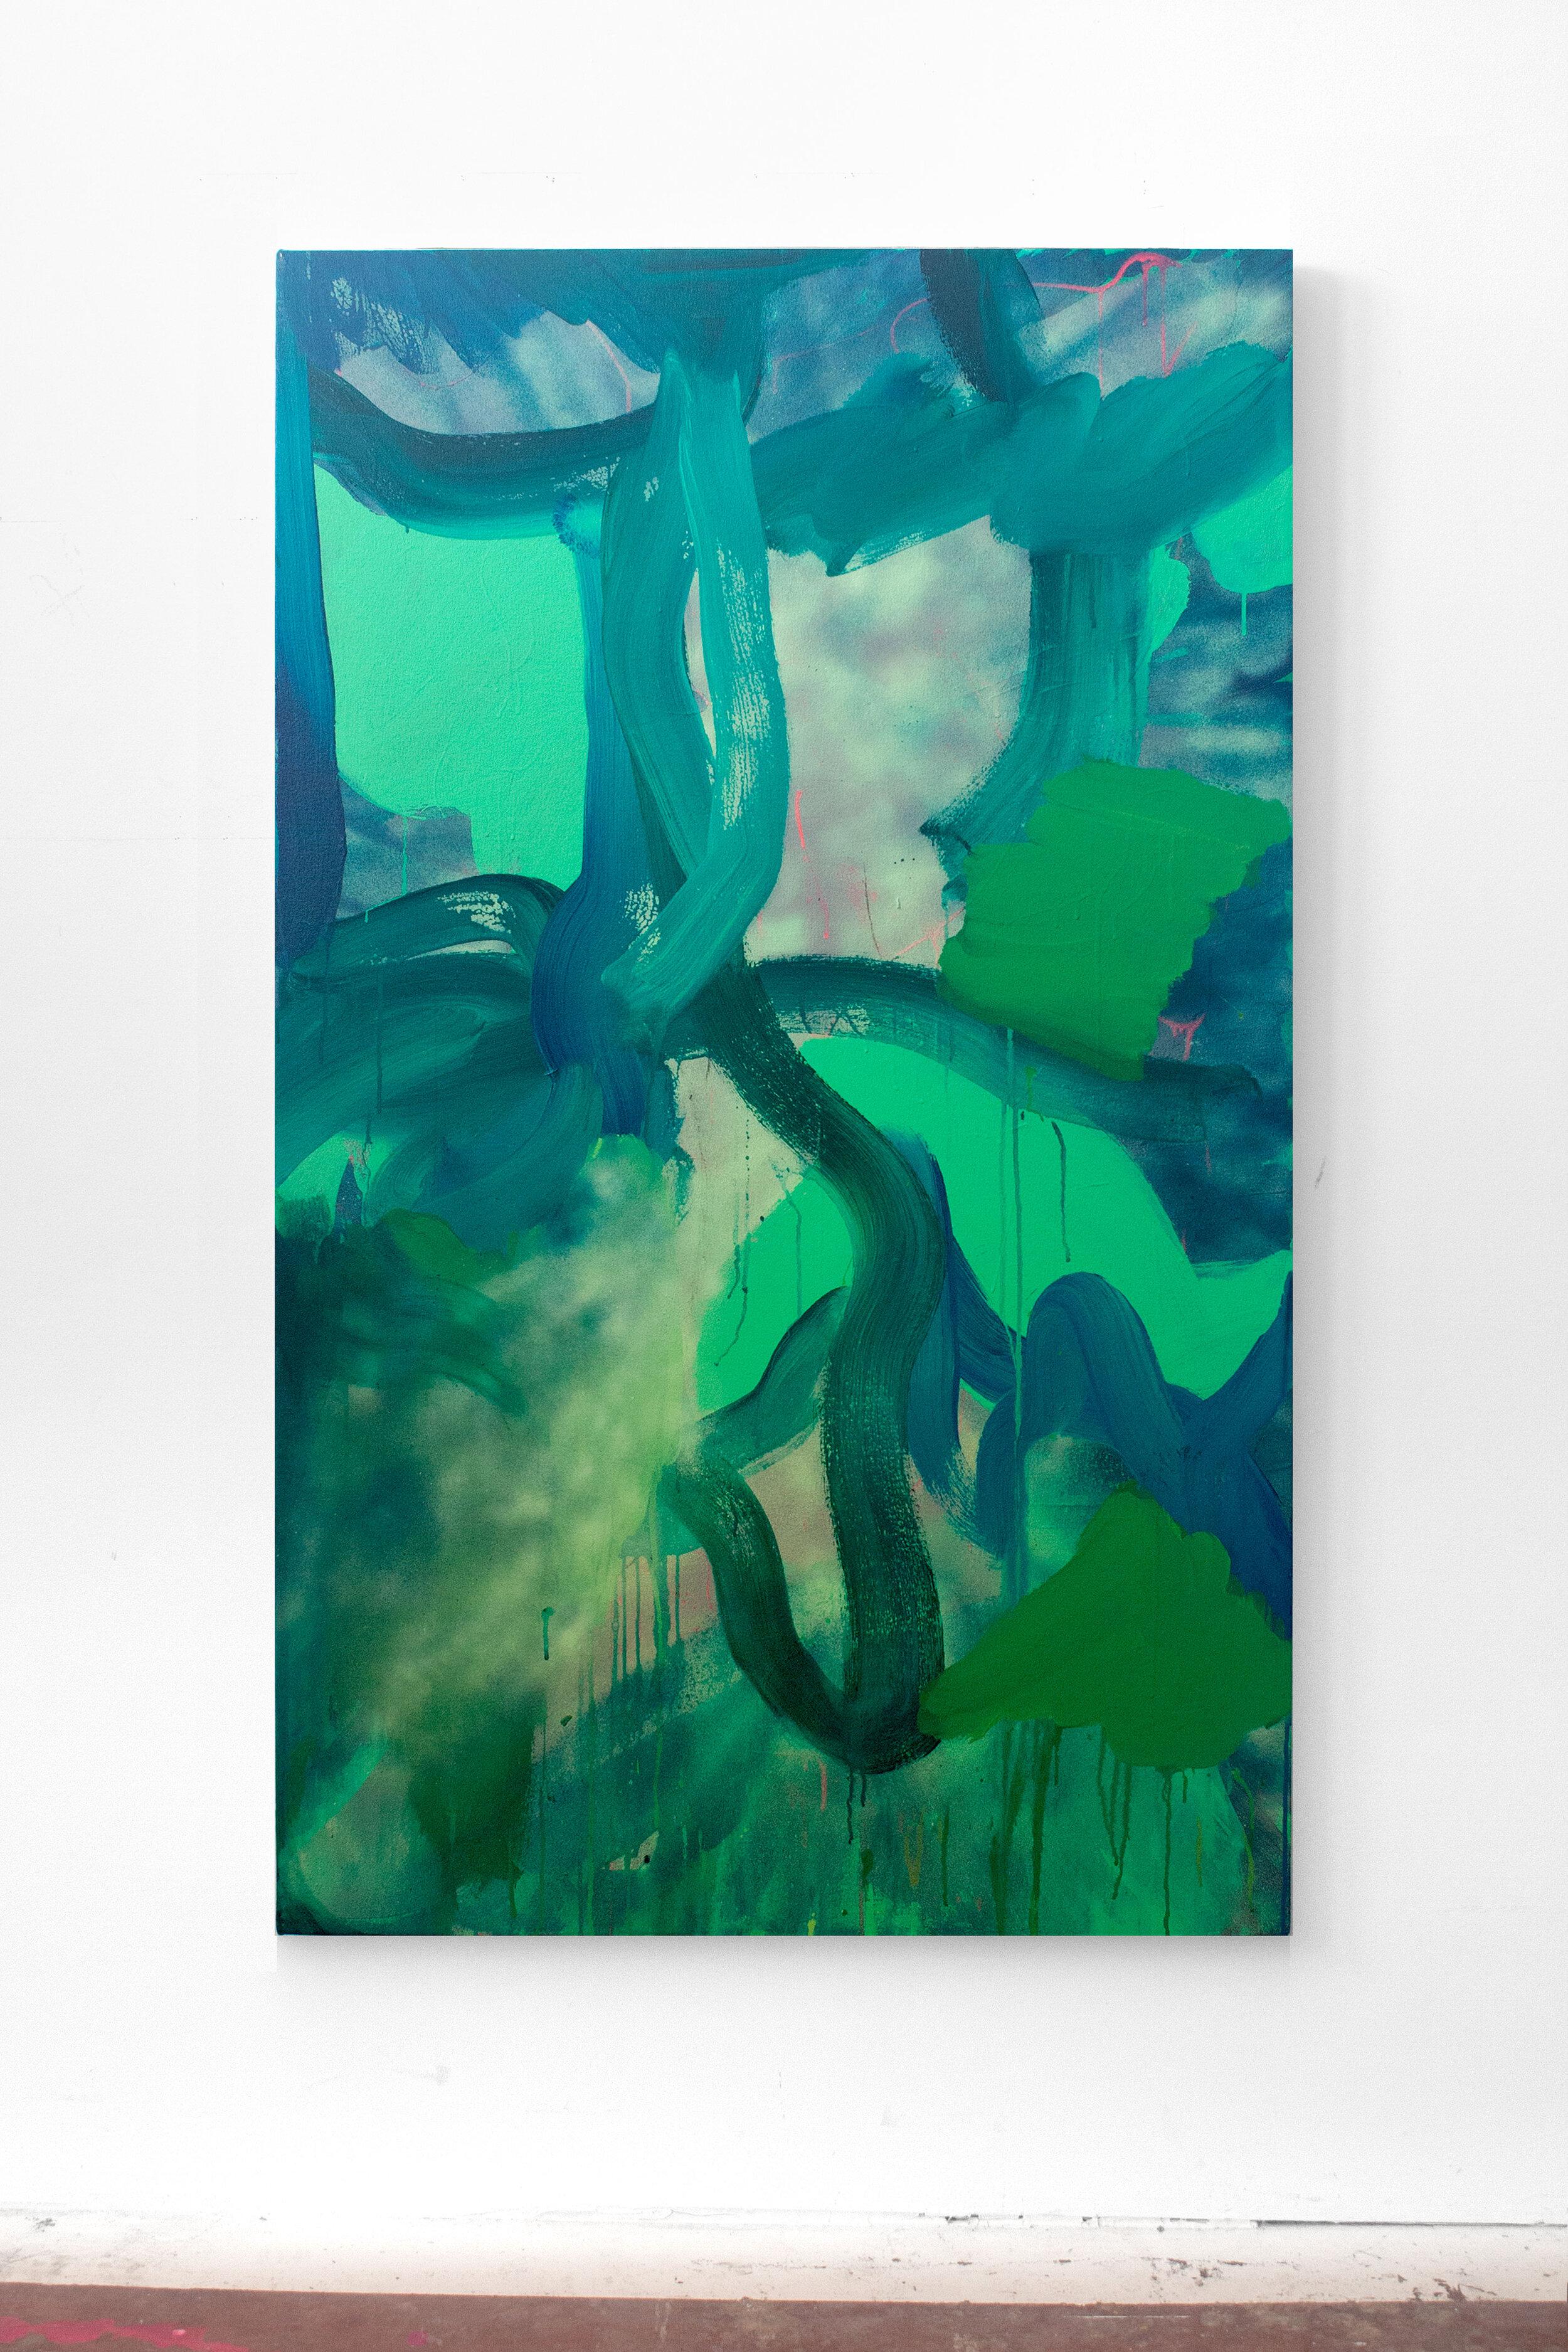 Loophole,  60 x 36 in., Acrylic on canvas, 2019